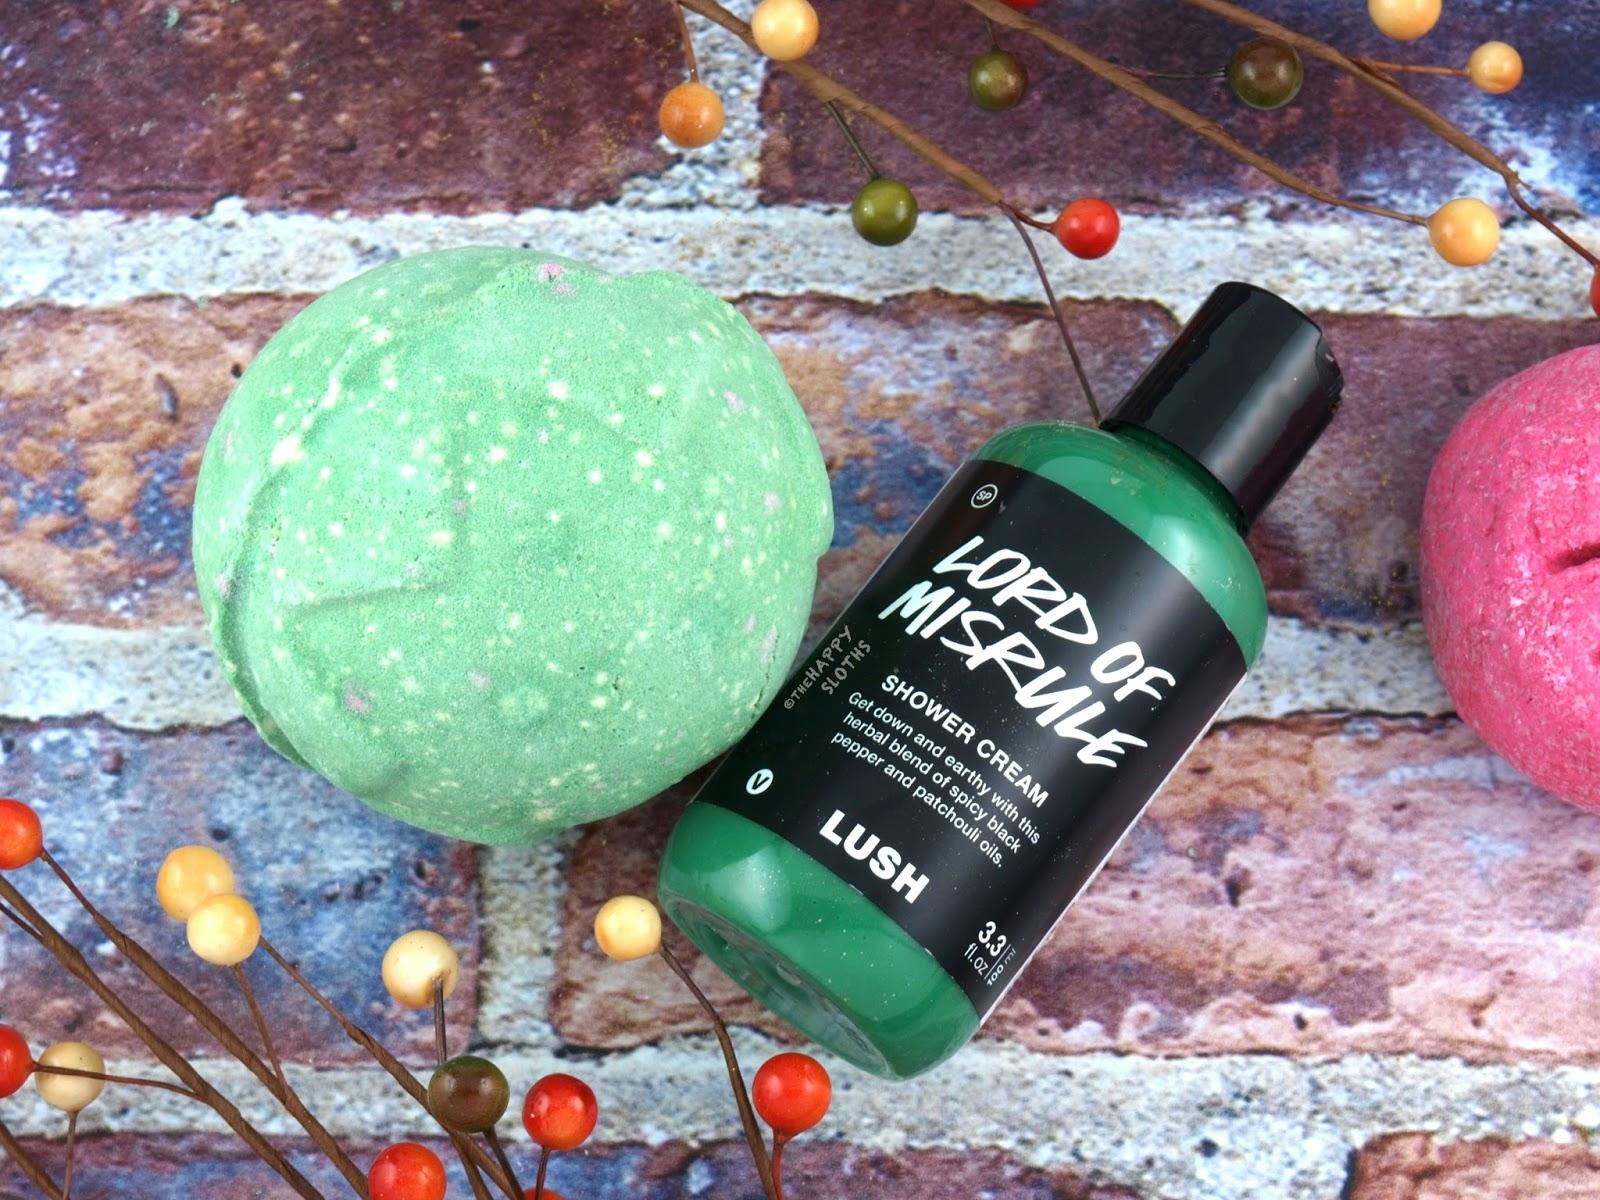 Lush Halloween 2017 Gift Guide: Lord of Misrule Bath Bomb & Shower Gel